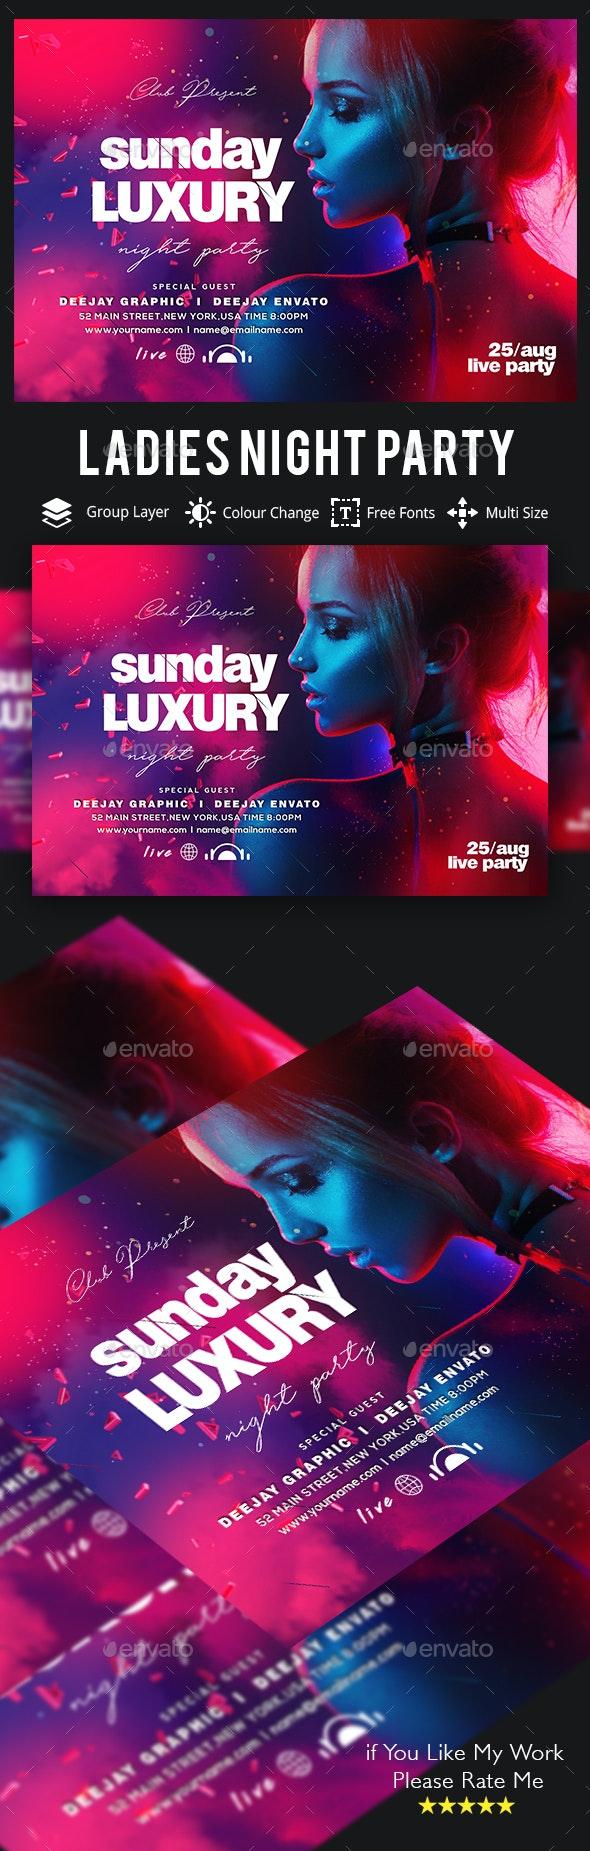 Guest DJ / Artist Flyer - Events Flyers